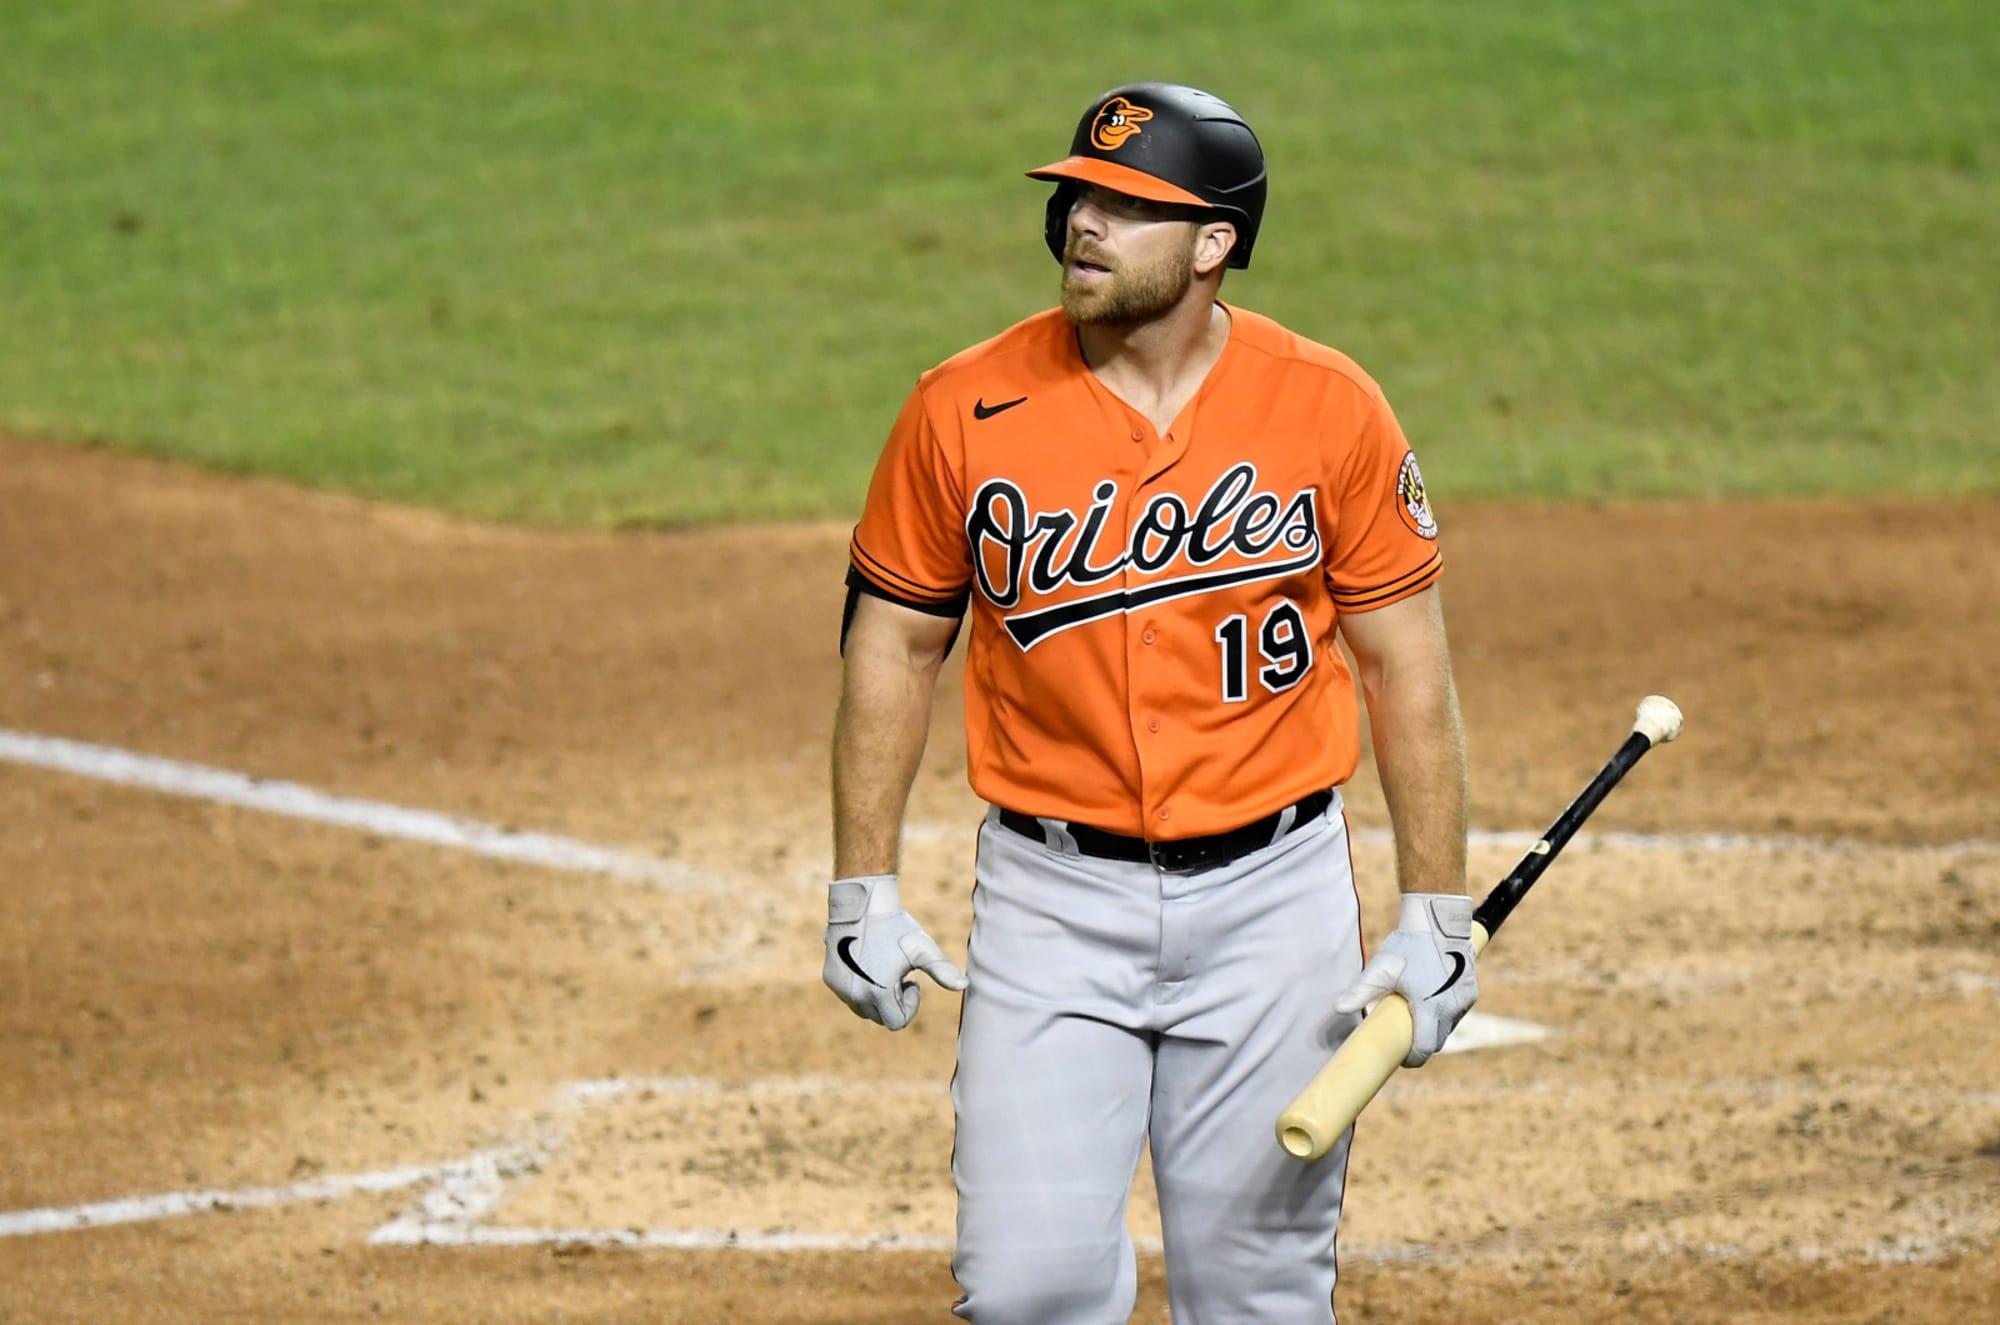 Chris Davis Baltimore Orioles Baseball Player Jersey